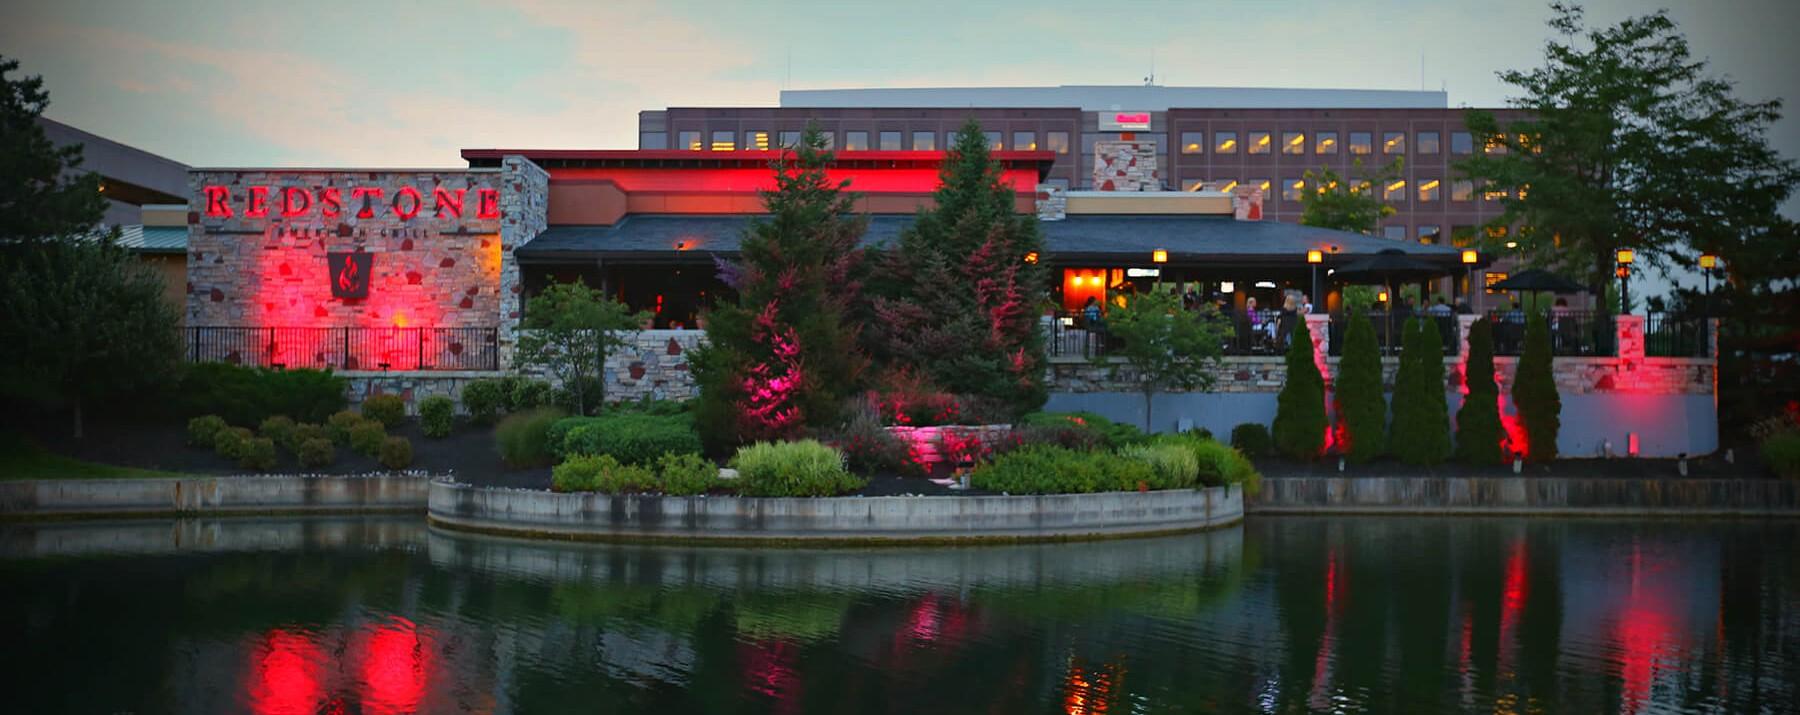 Oakbrook Terrace | Redstone Grill